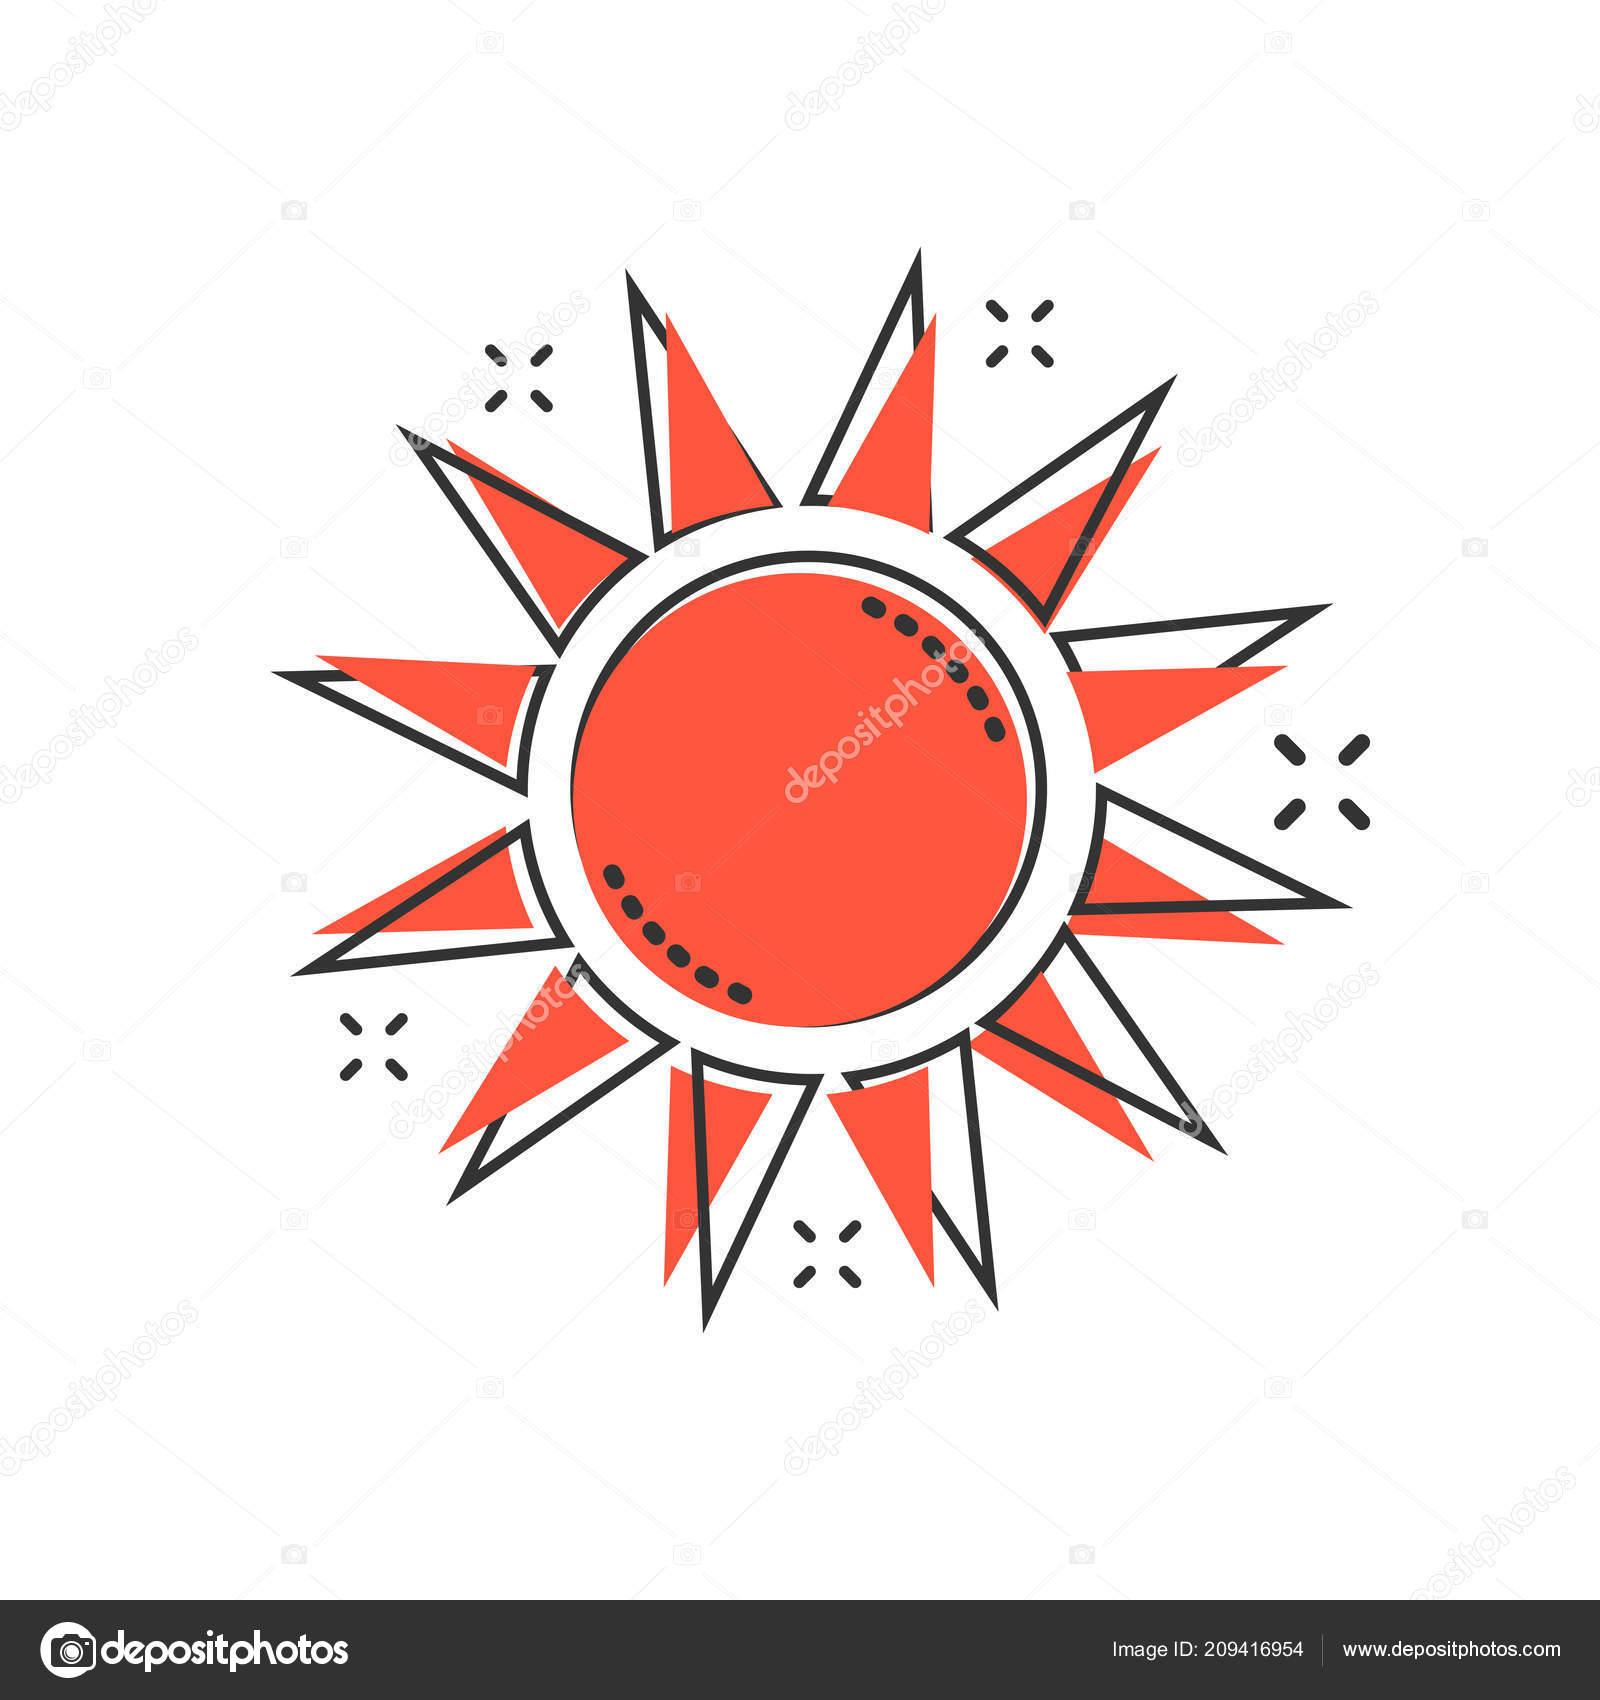 Vektor Kreslene Ikona Slunce Komicke Stylu Letni Slunicko Koncept